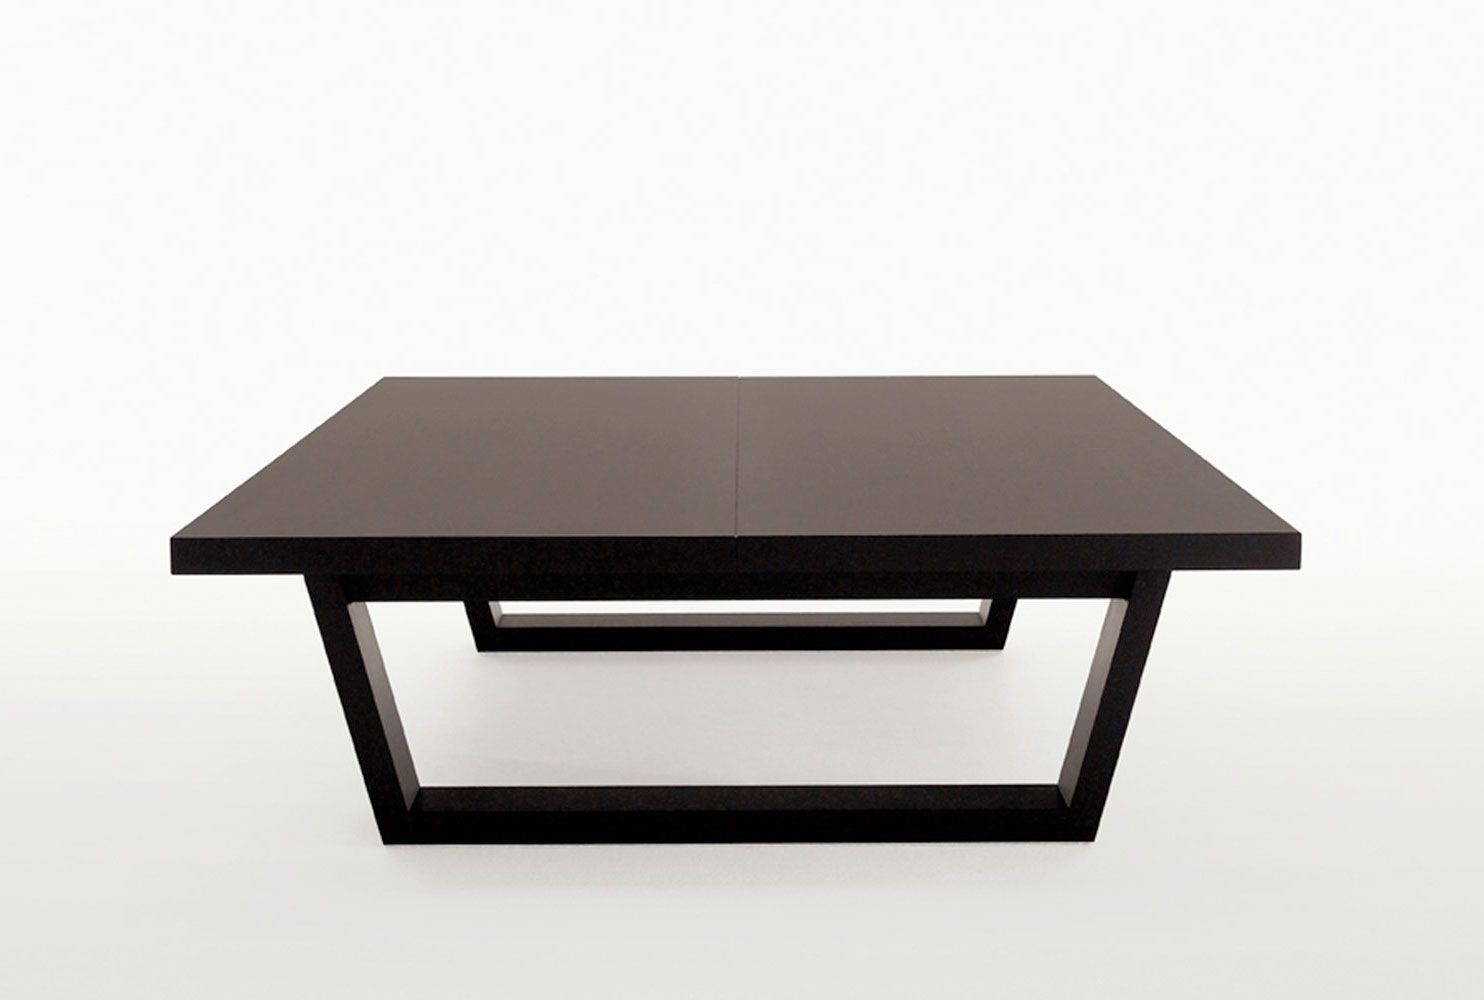 Small Tables Xilos Collection Maxalto Design Antonio Citterio Coffee Table Square Solid Wood Coffee Table Wood Coffee Table Design [ 1000 x 1484 Pixel ]